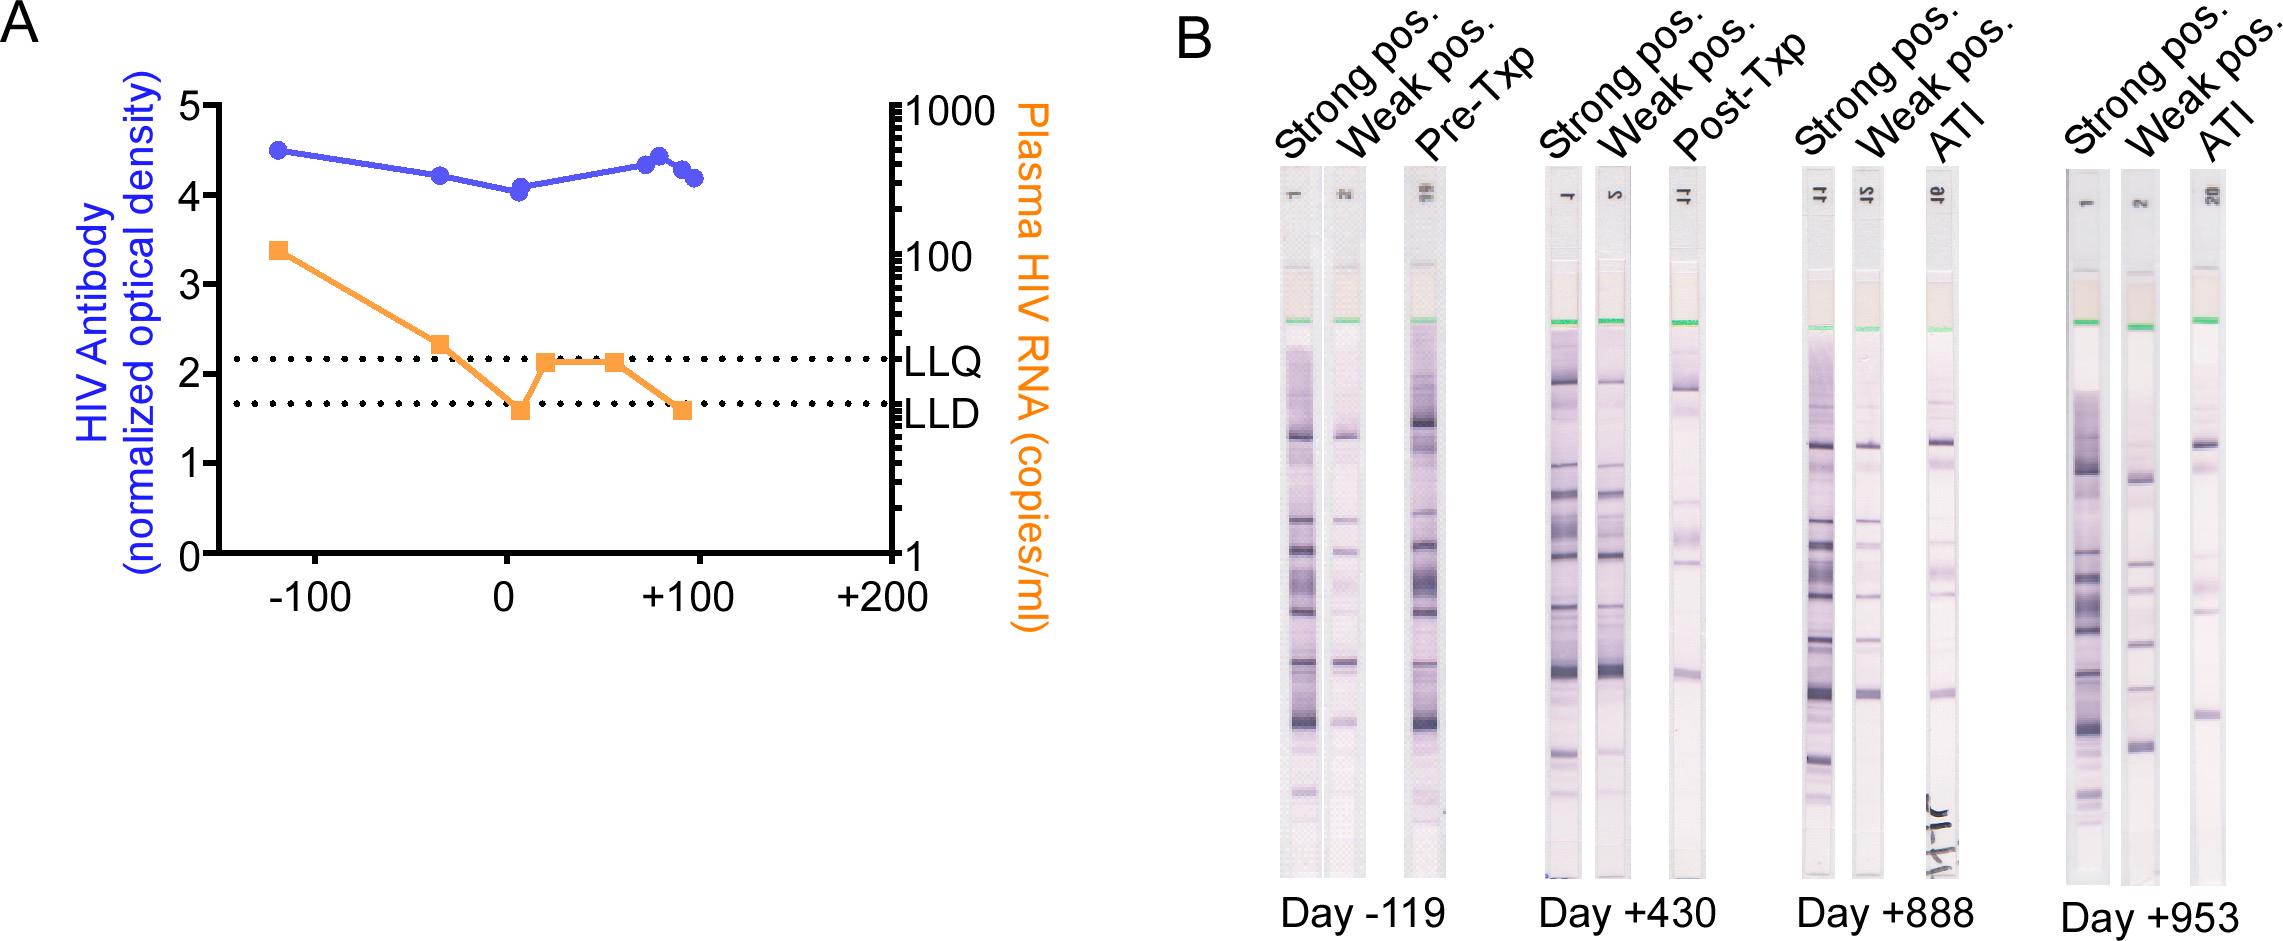 HIV-1 antibody assessment in the peri-transplant period.